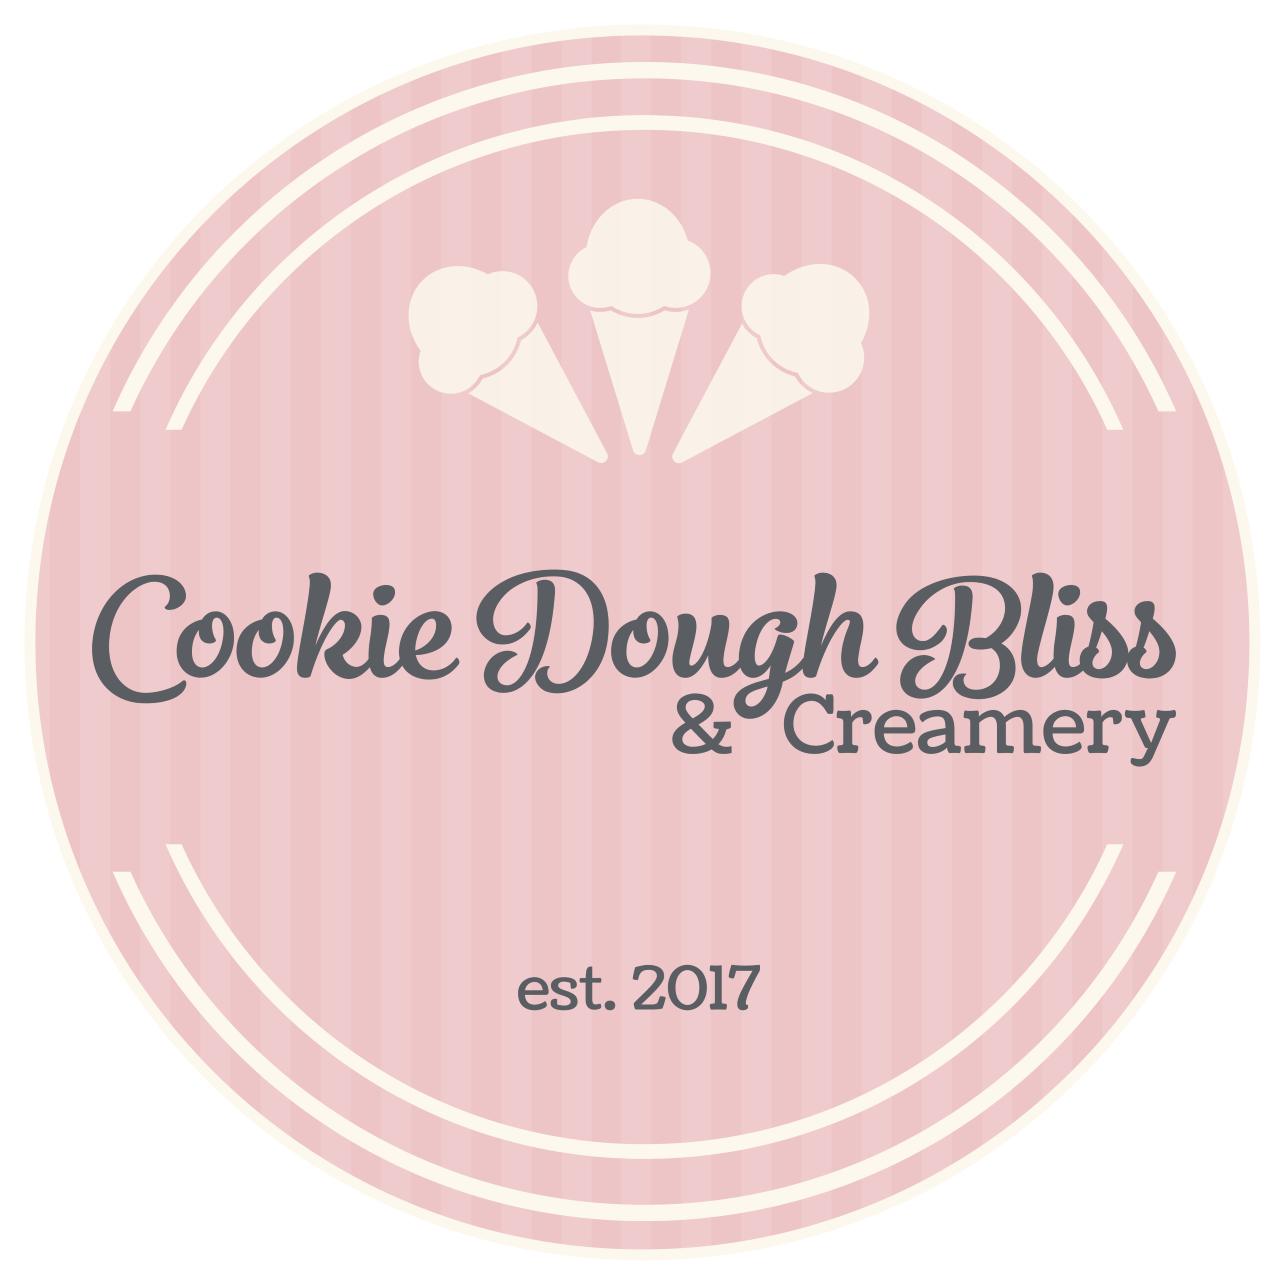 Cookie Dough Bliss & Creamery